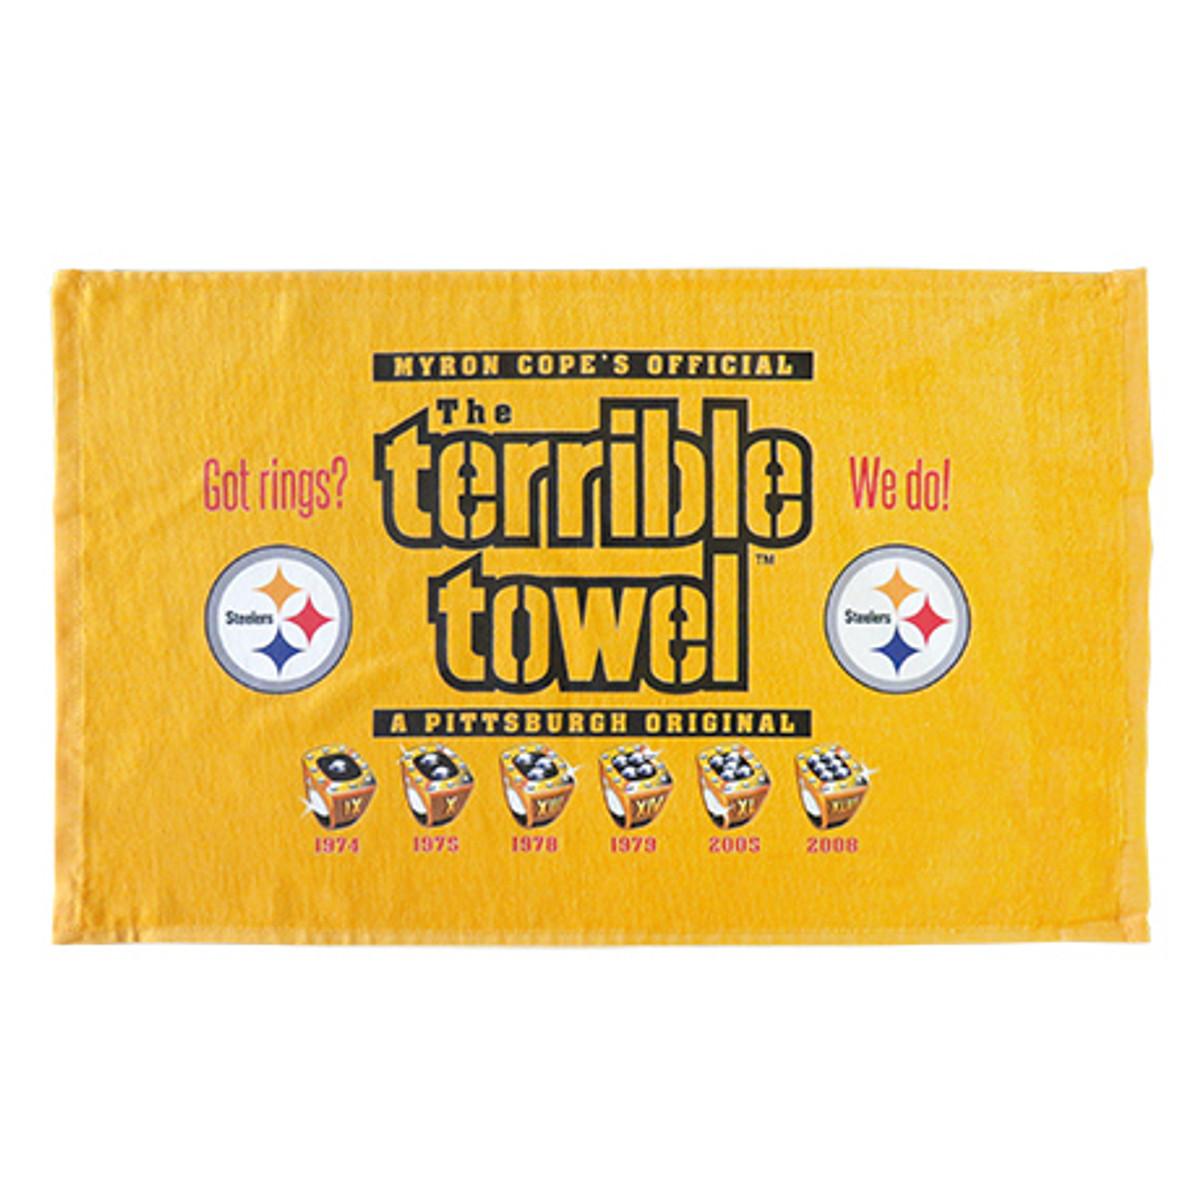 Myron Cope's Pittsburgh Steelers Terrible Towel - Got Rings